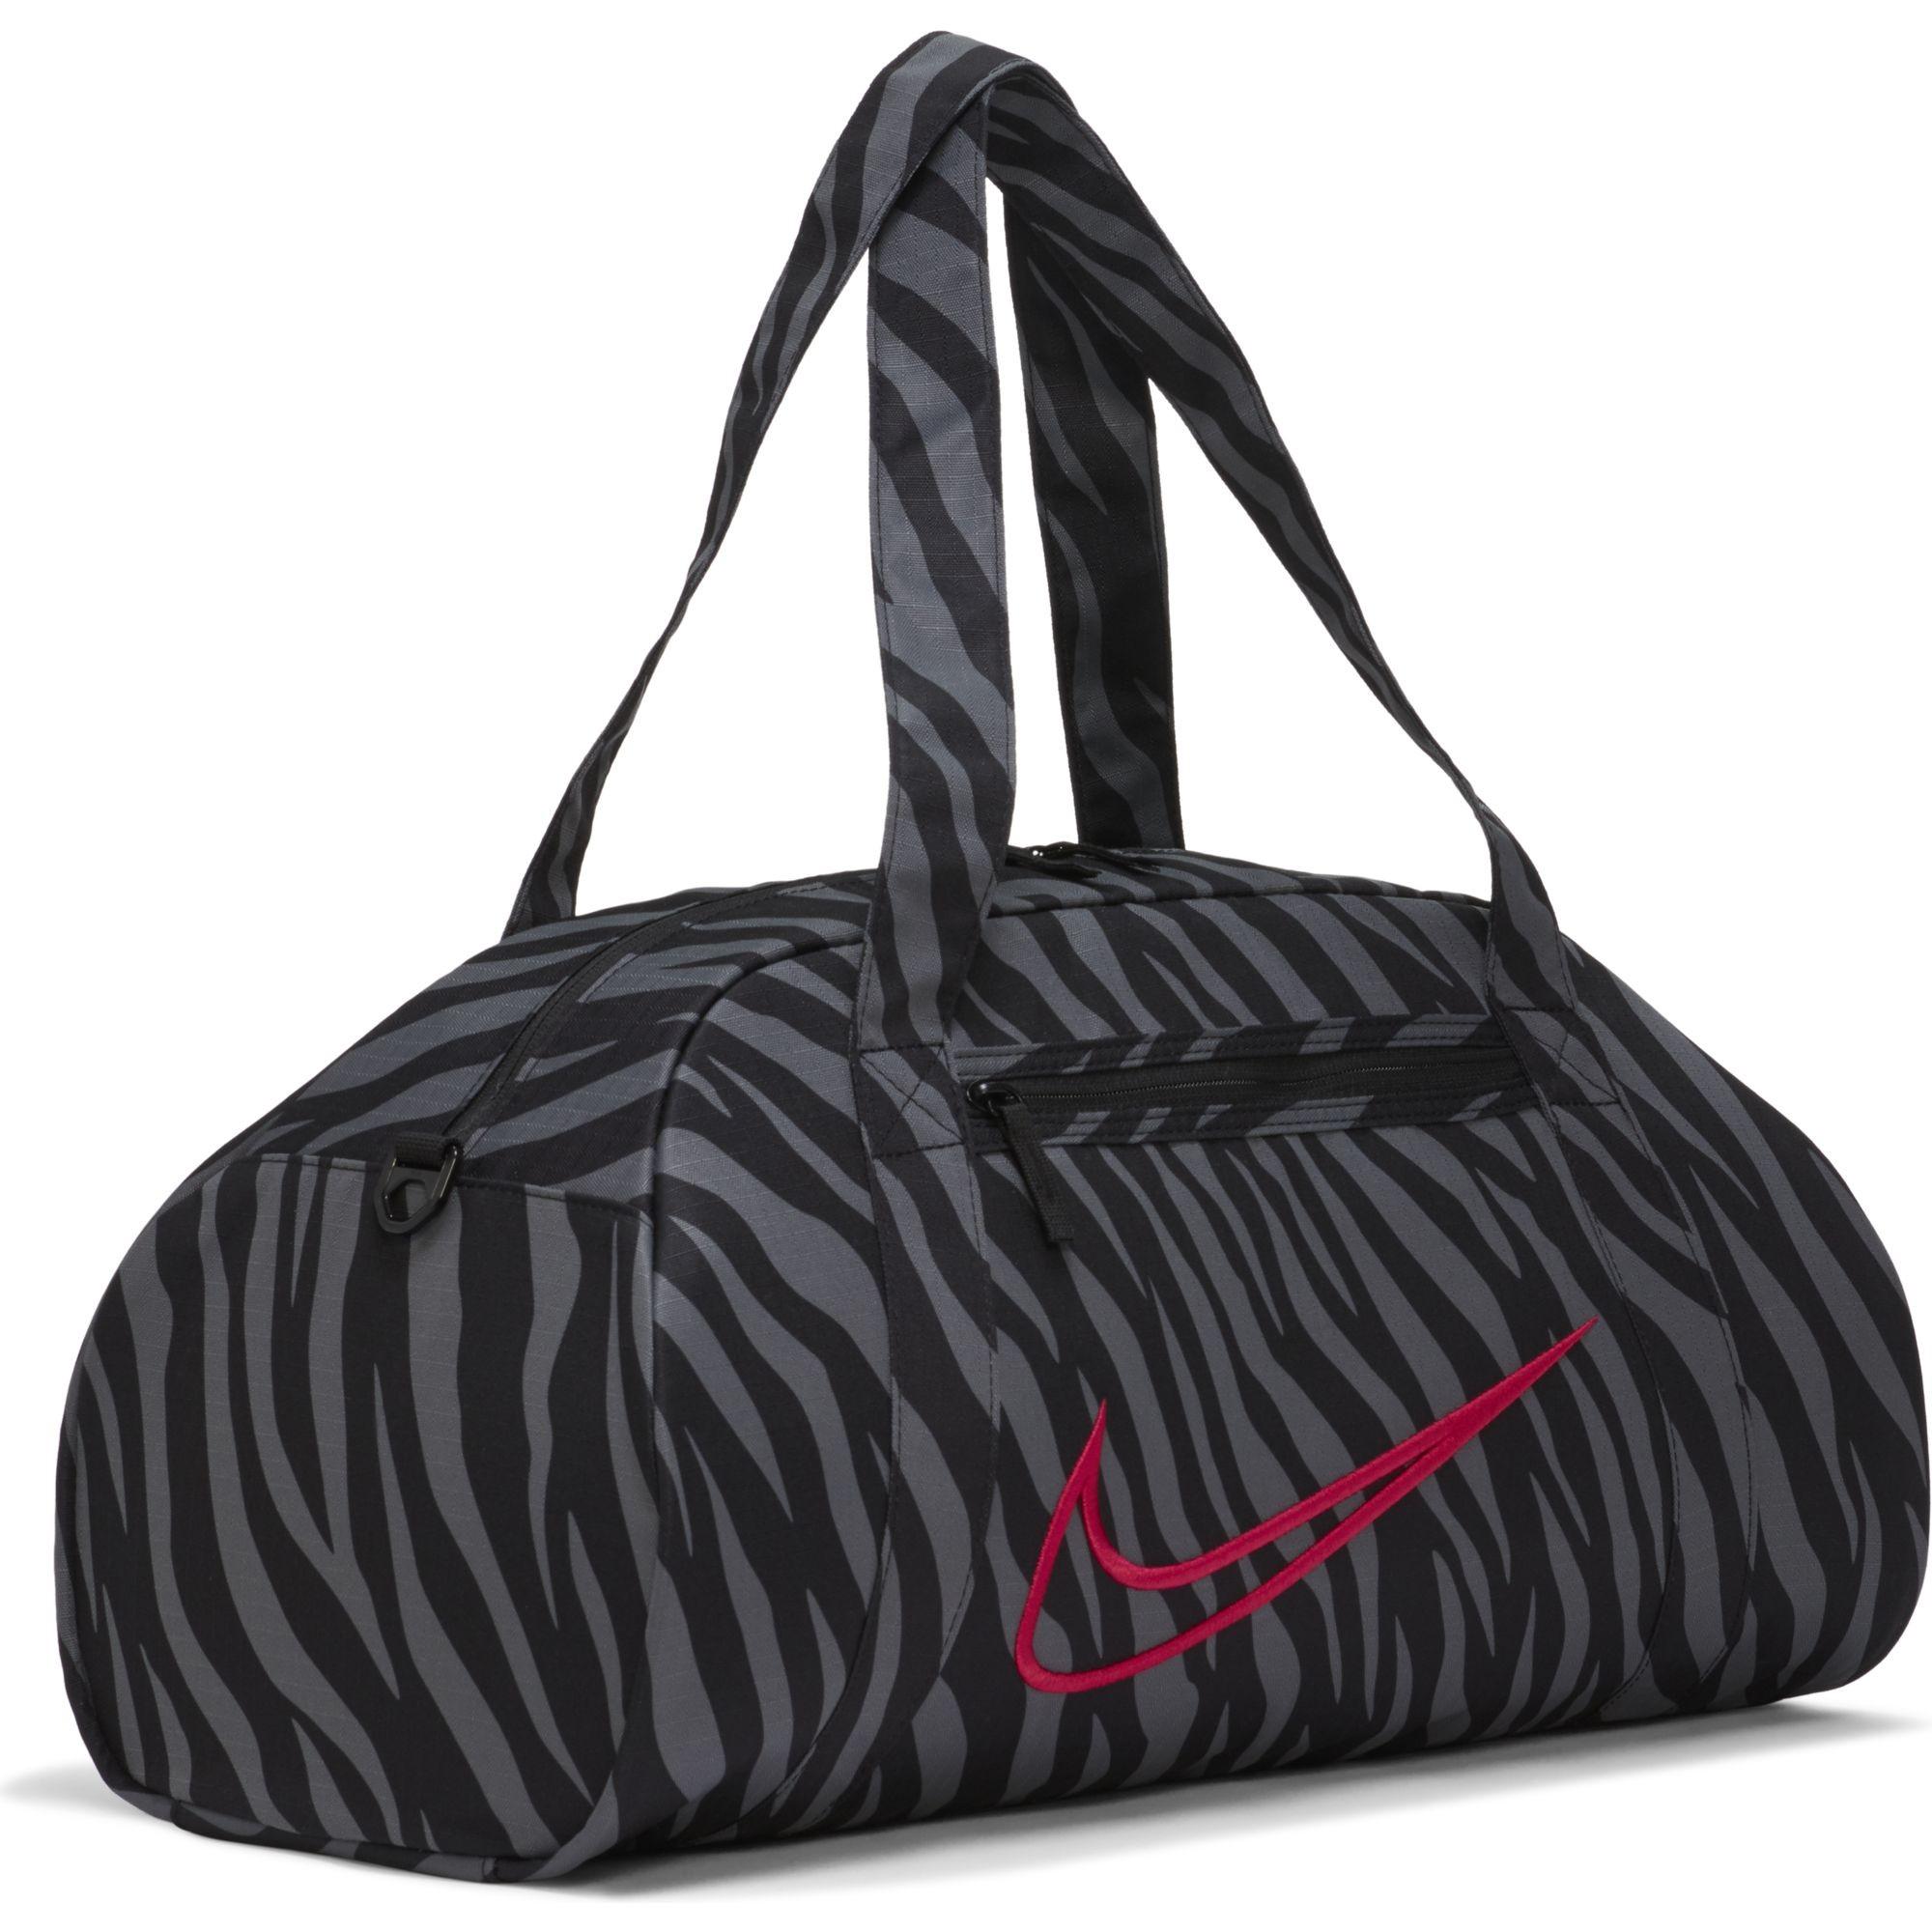 Nike Gym Club Sporttasche, schwarz, Damen Damen CW7205-010